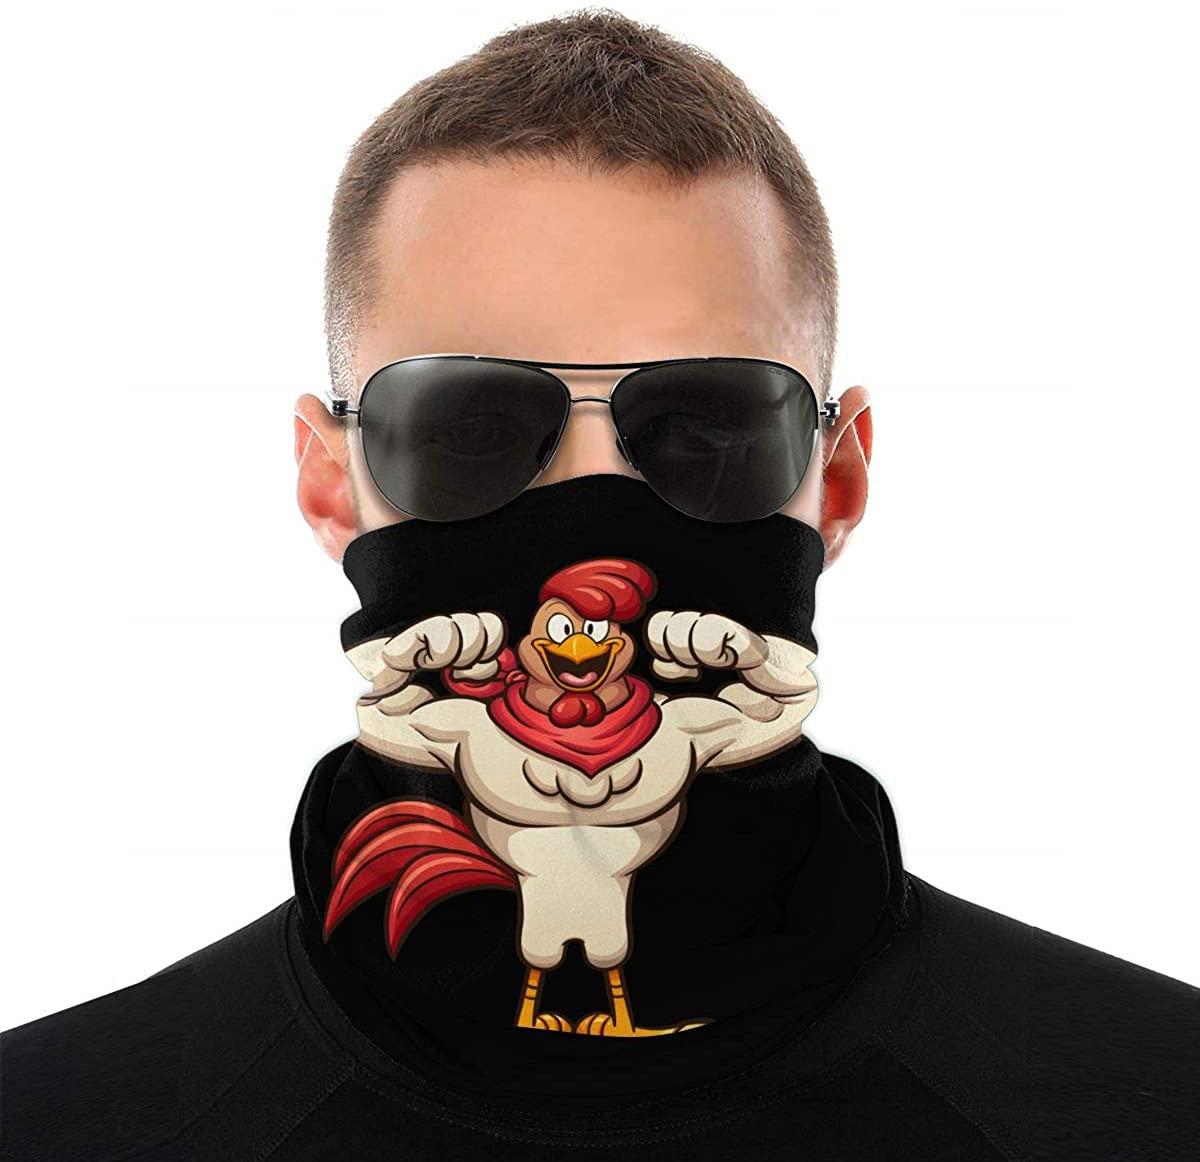 Funny Strong Rooster Cartoon Seamless Bandana Face Mask for Men Women Scarf Headband Sweatband